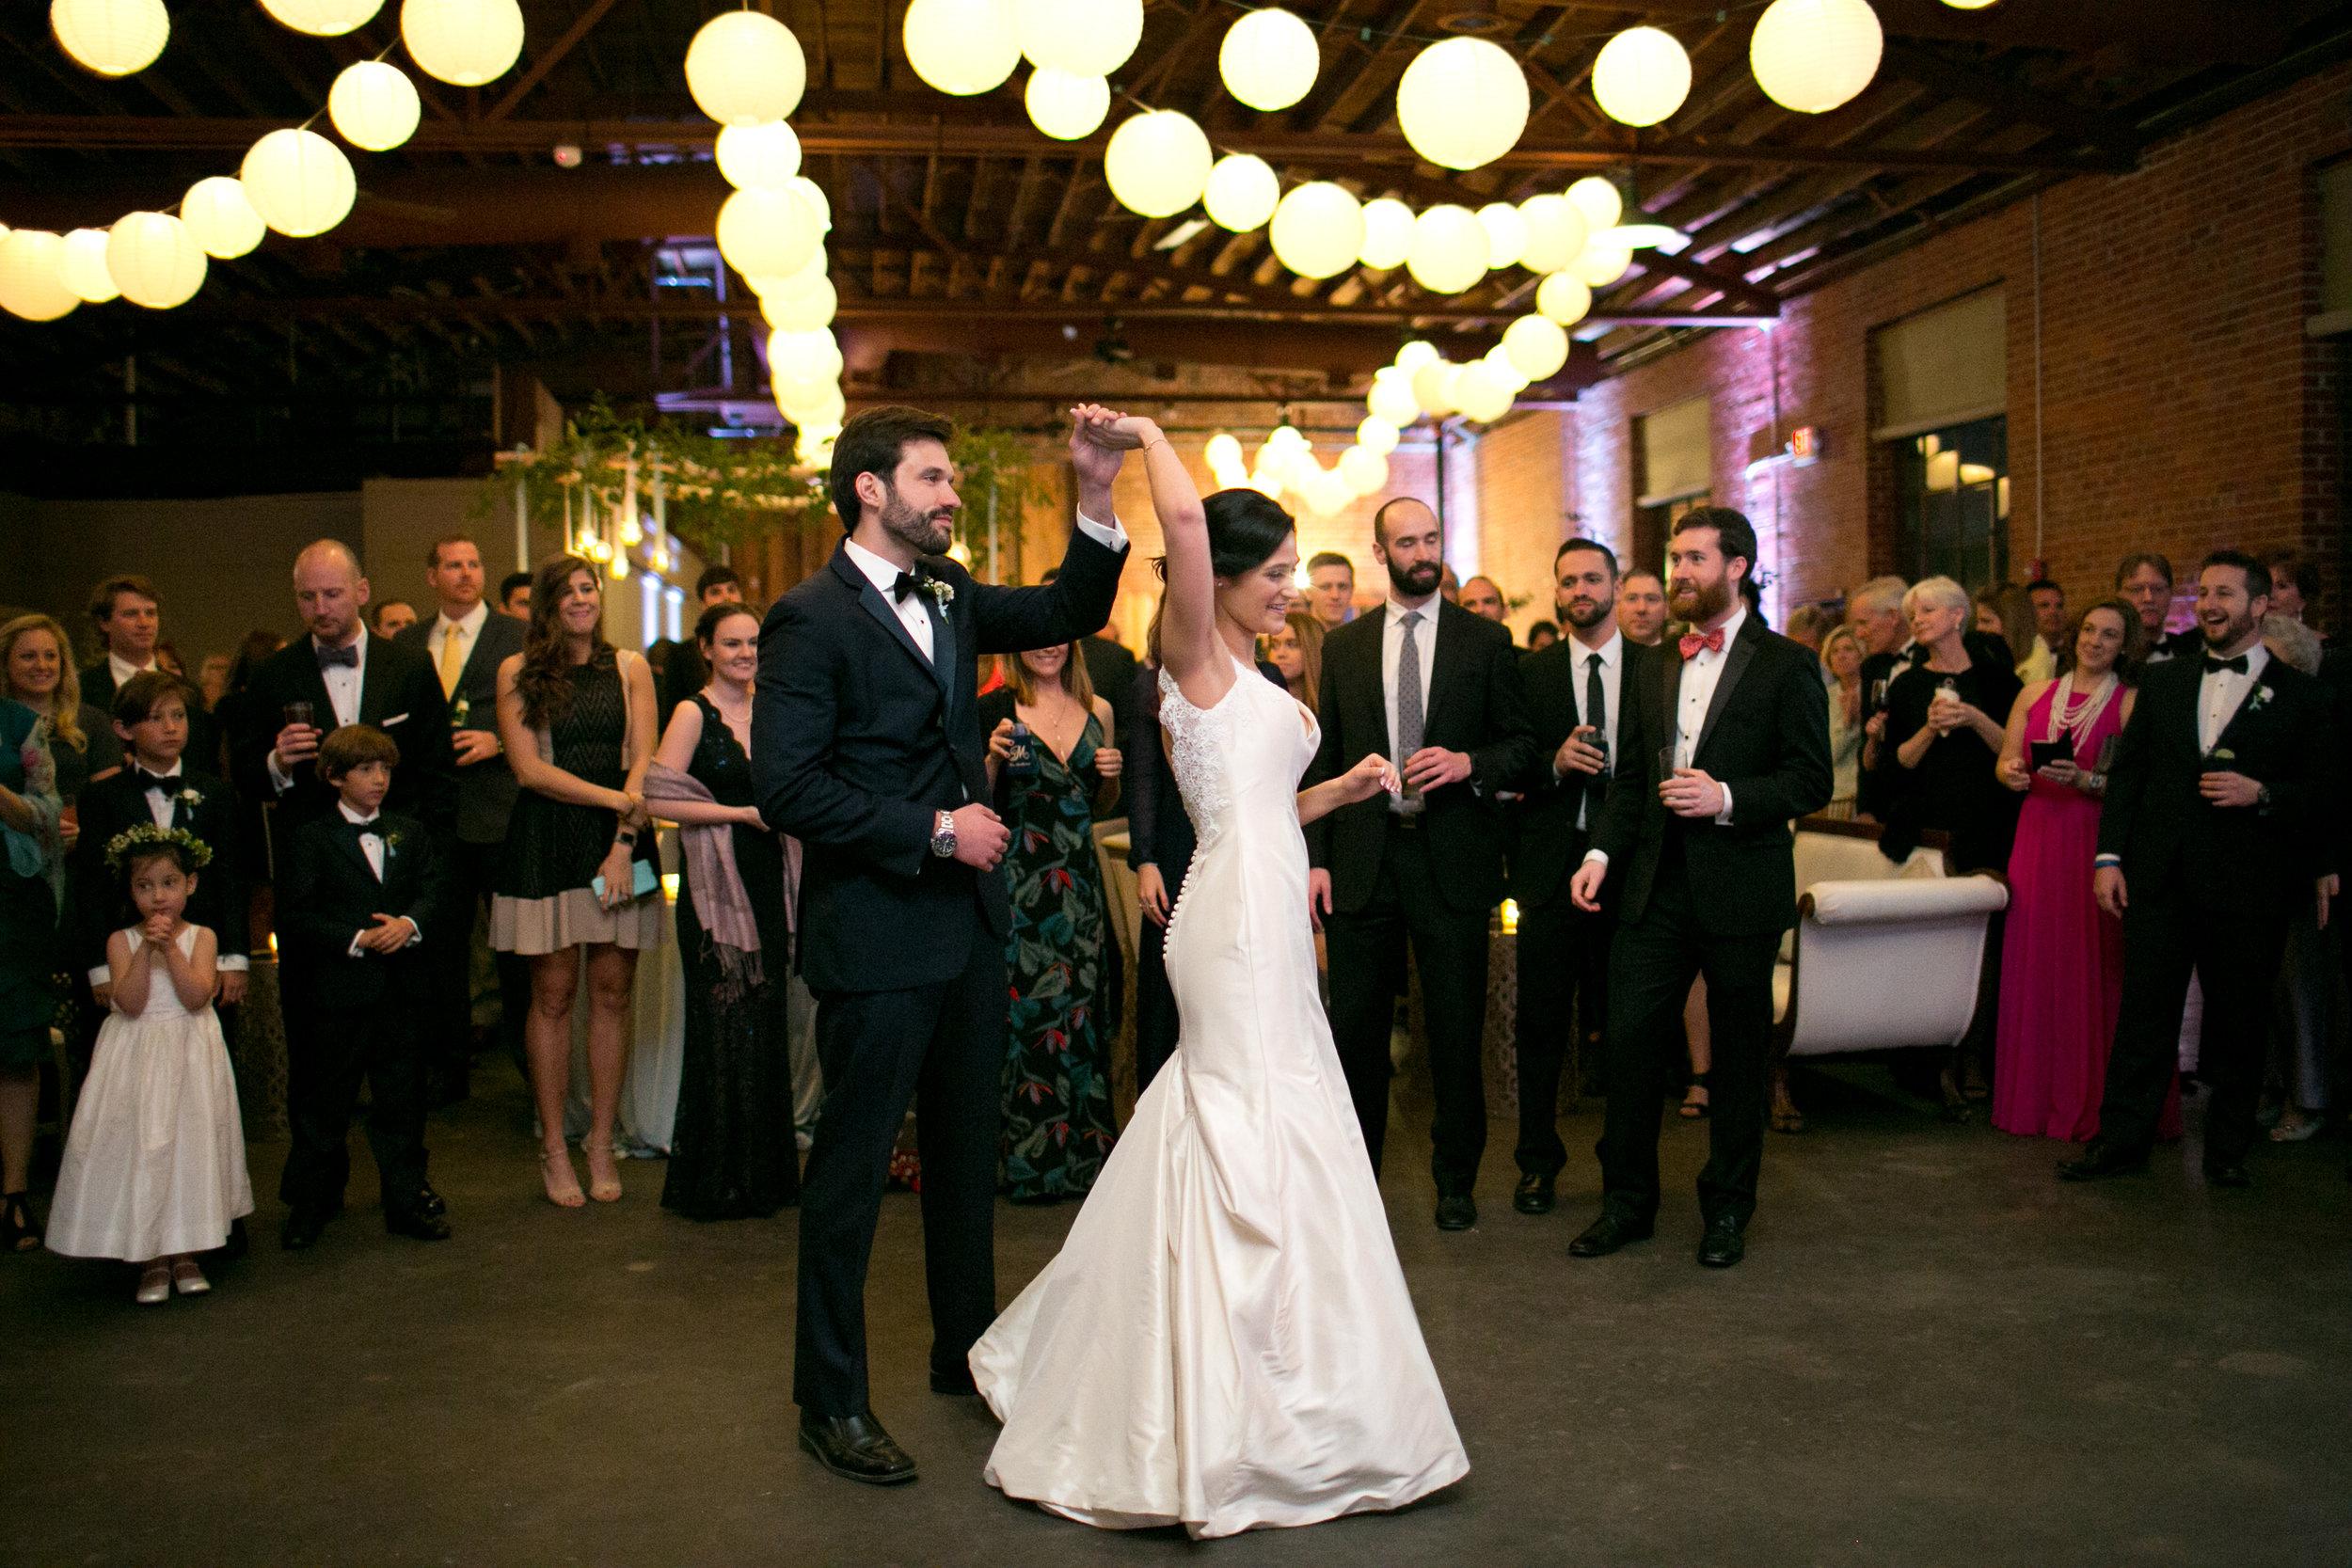 columbia_sc_wedding179.jpg